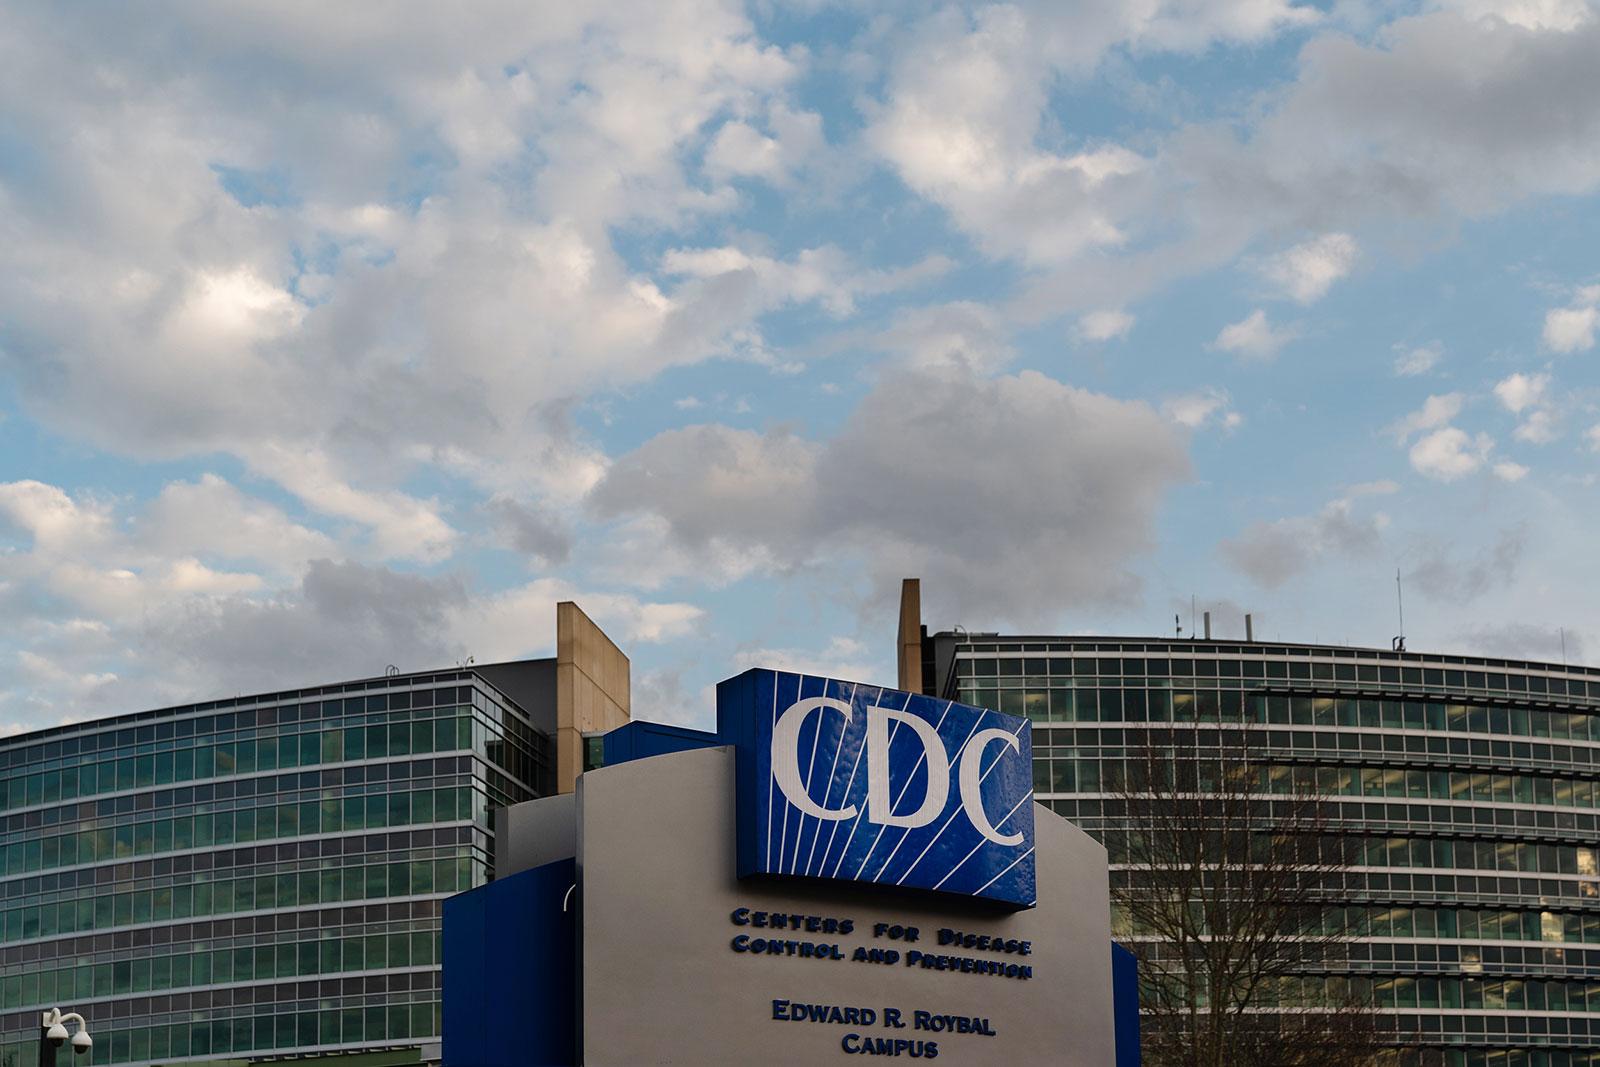 The CDC headquarters in Atlanta, Georgia.